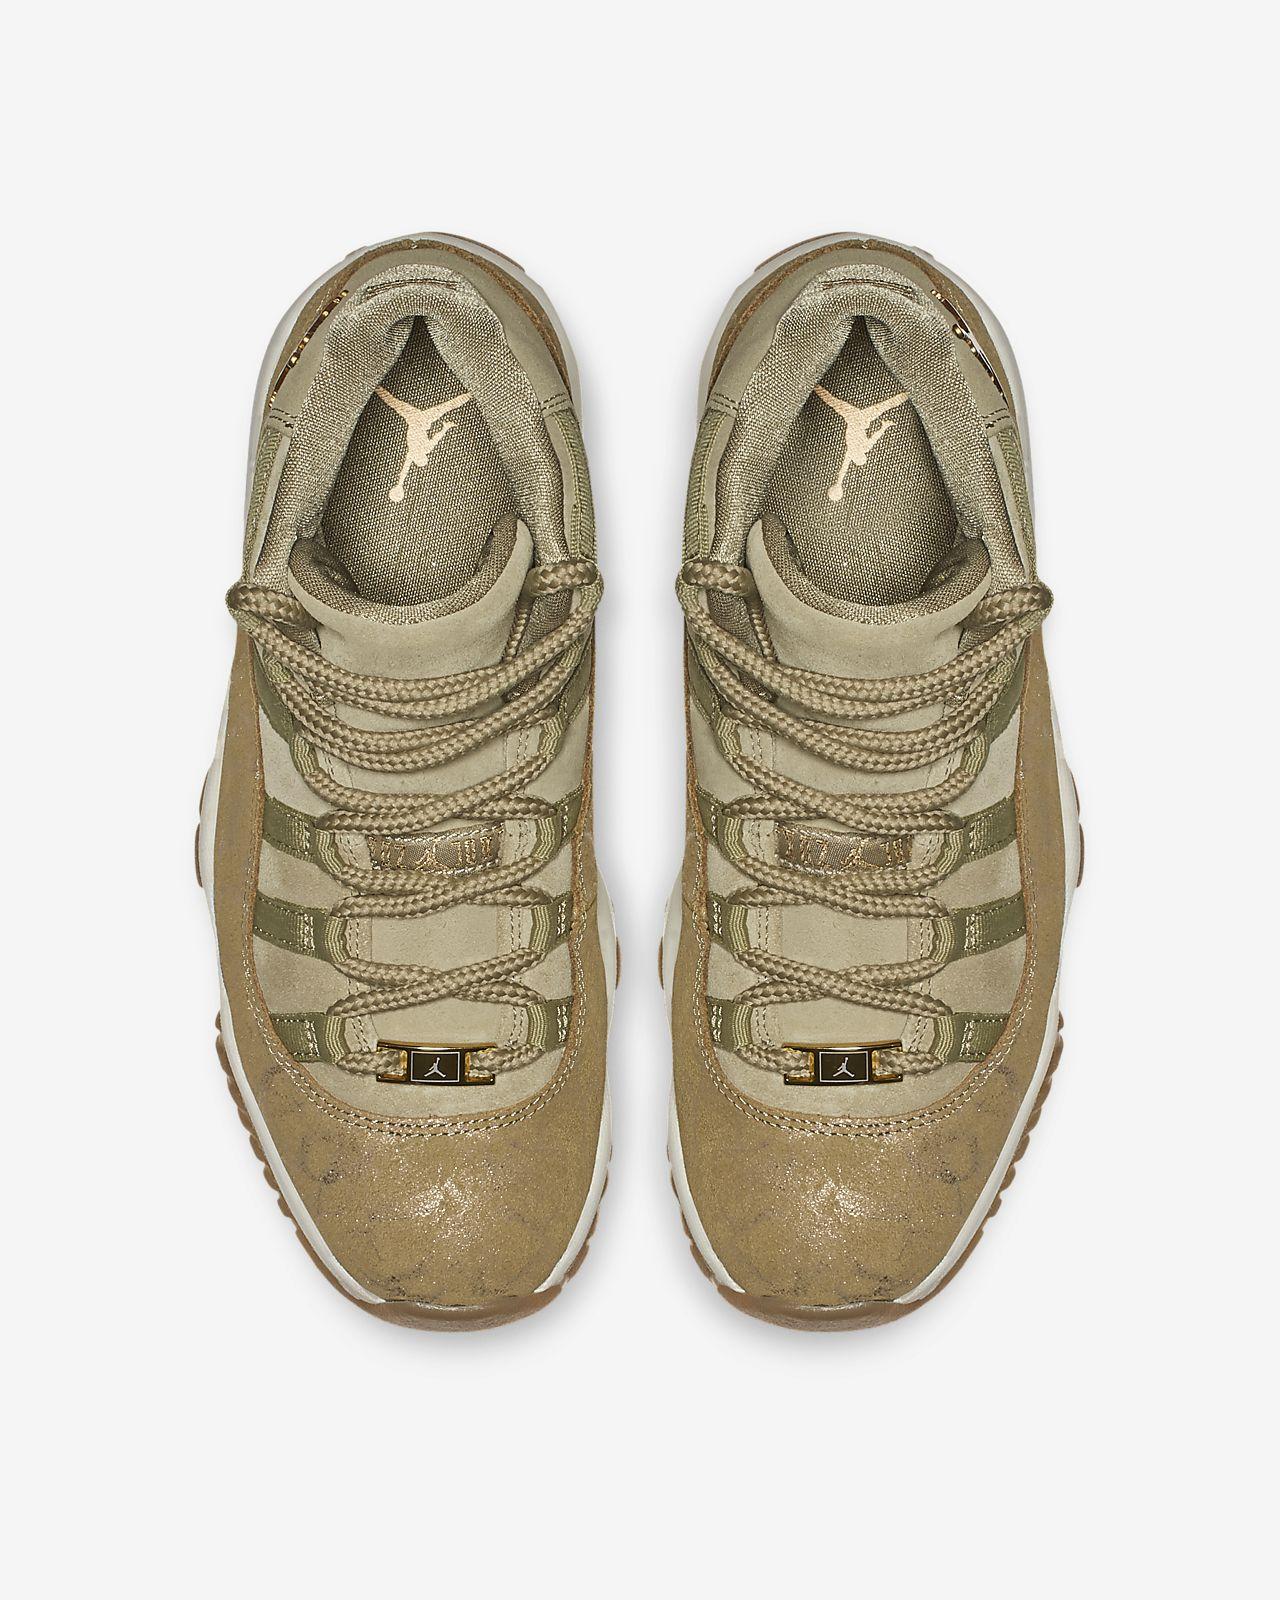 8f6ff52bc9 Air Jordan 11 Retro Women's Shoe. Nike.com ZA